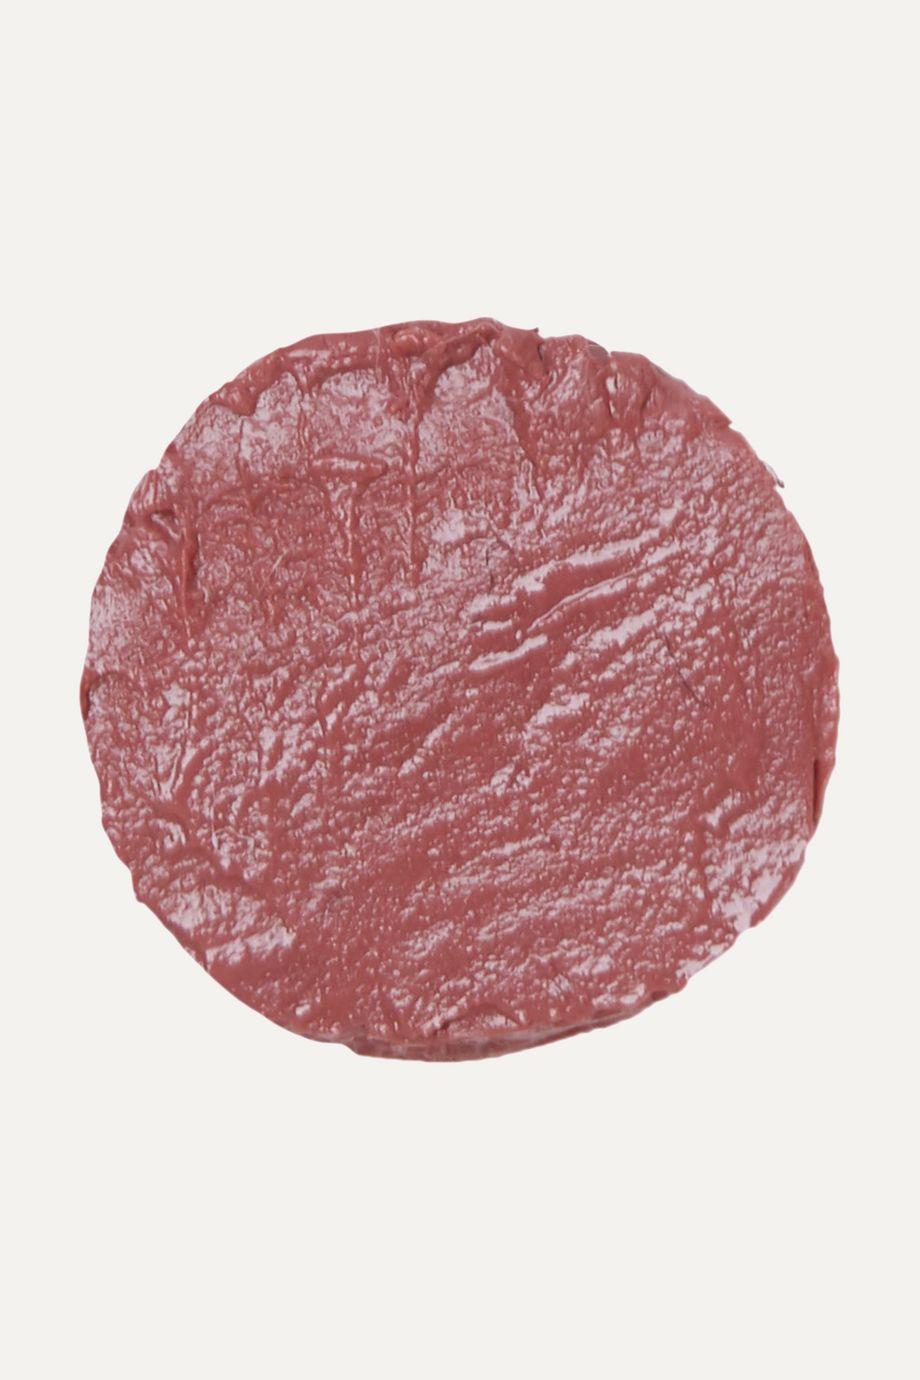 Charlotte Tilbury Superstar Lips Lipstick - Pillow Talk